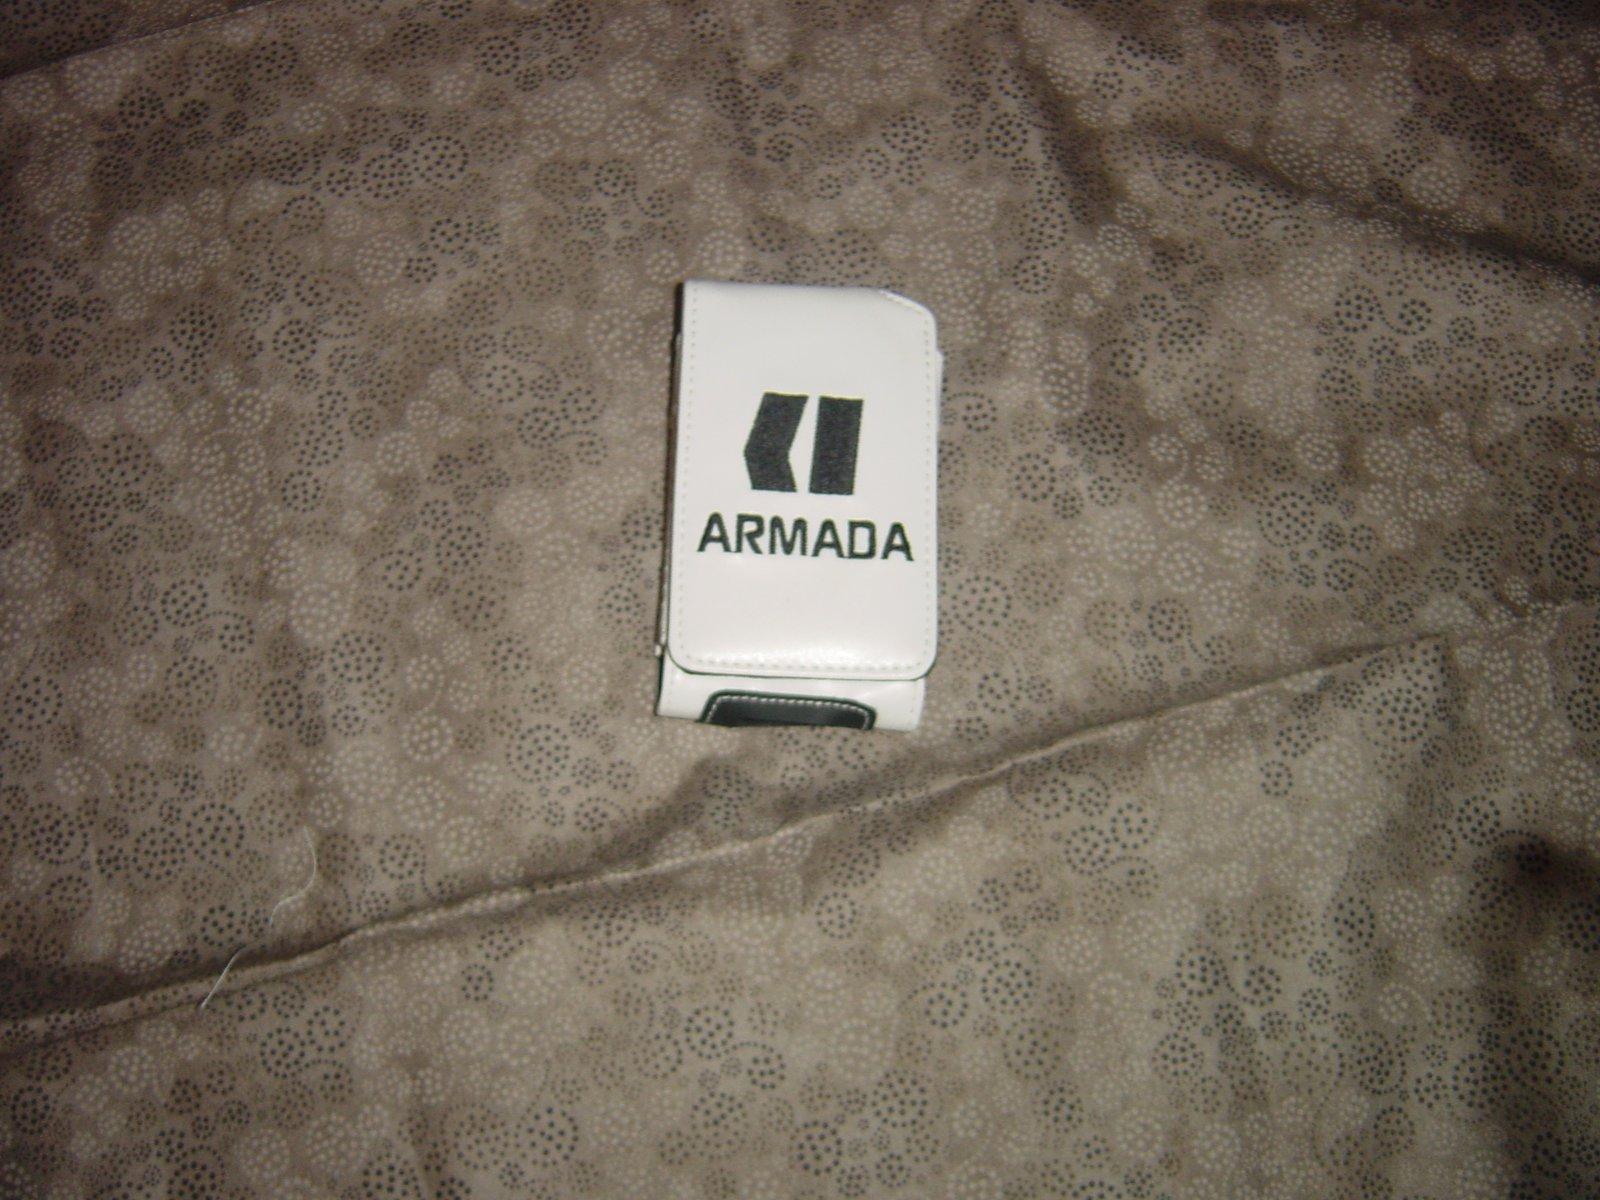 Armada ipod case